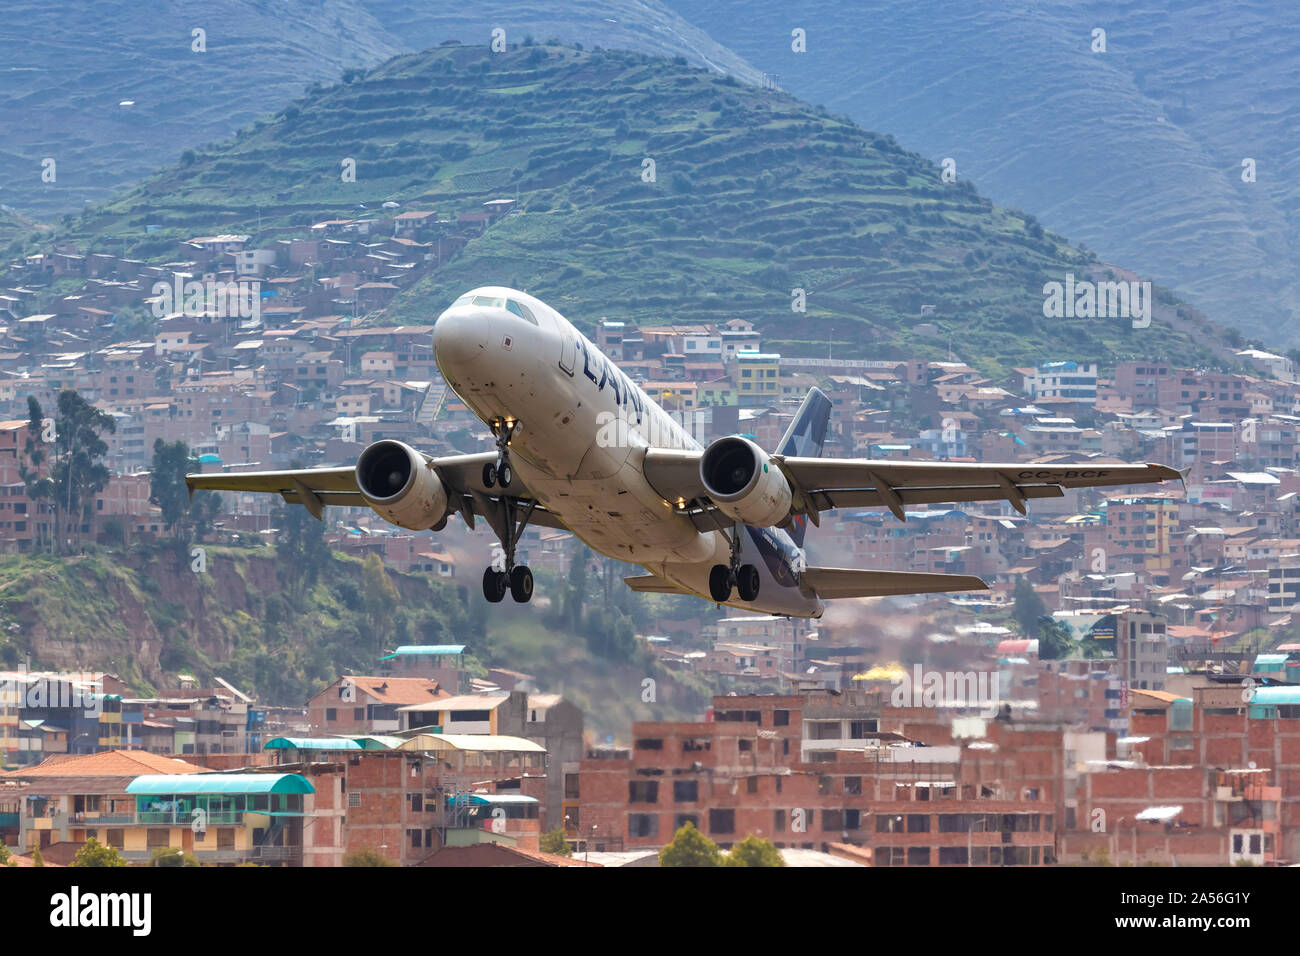 Cusco Peru Febrero 2 2019 El Avion Airbus A319 De Lan Al Aeropuerto De Cusco Cuz En Peru Fotografia De Stock Alamy